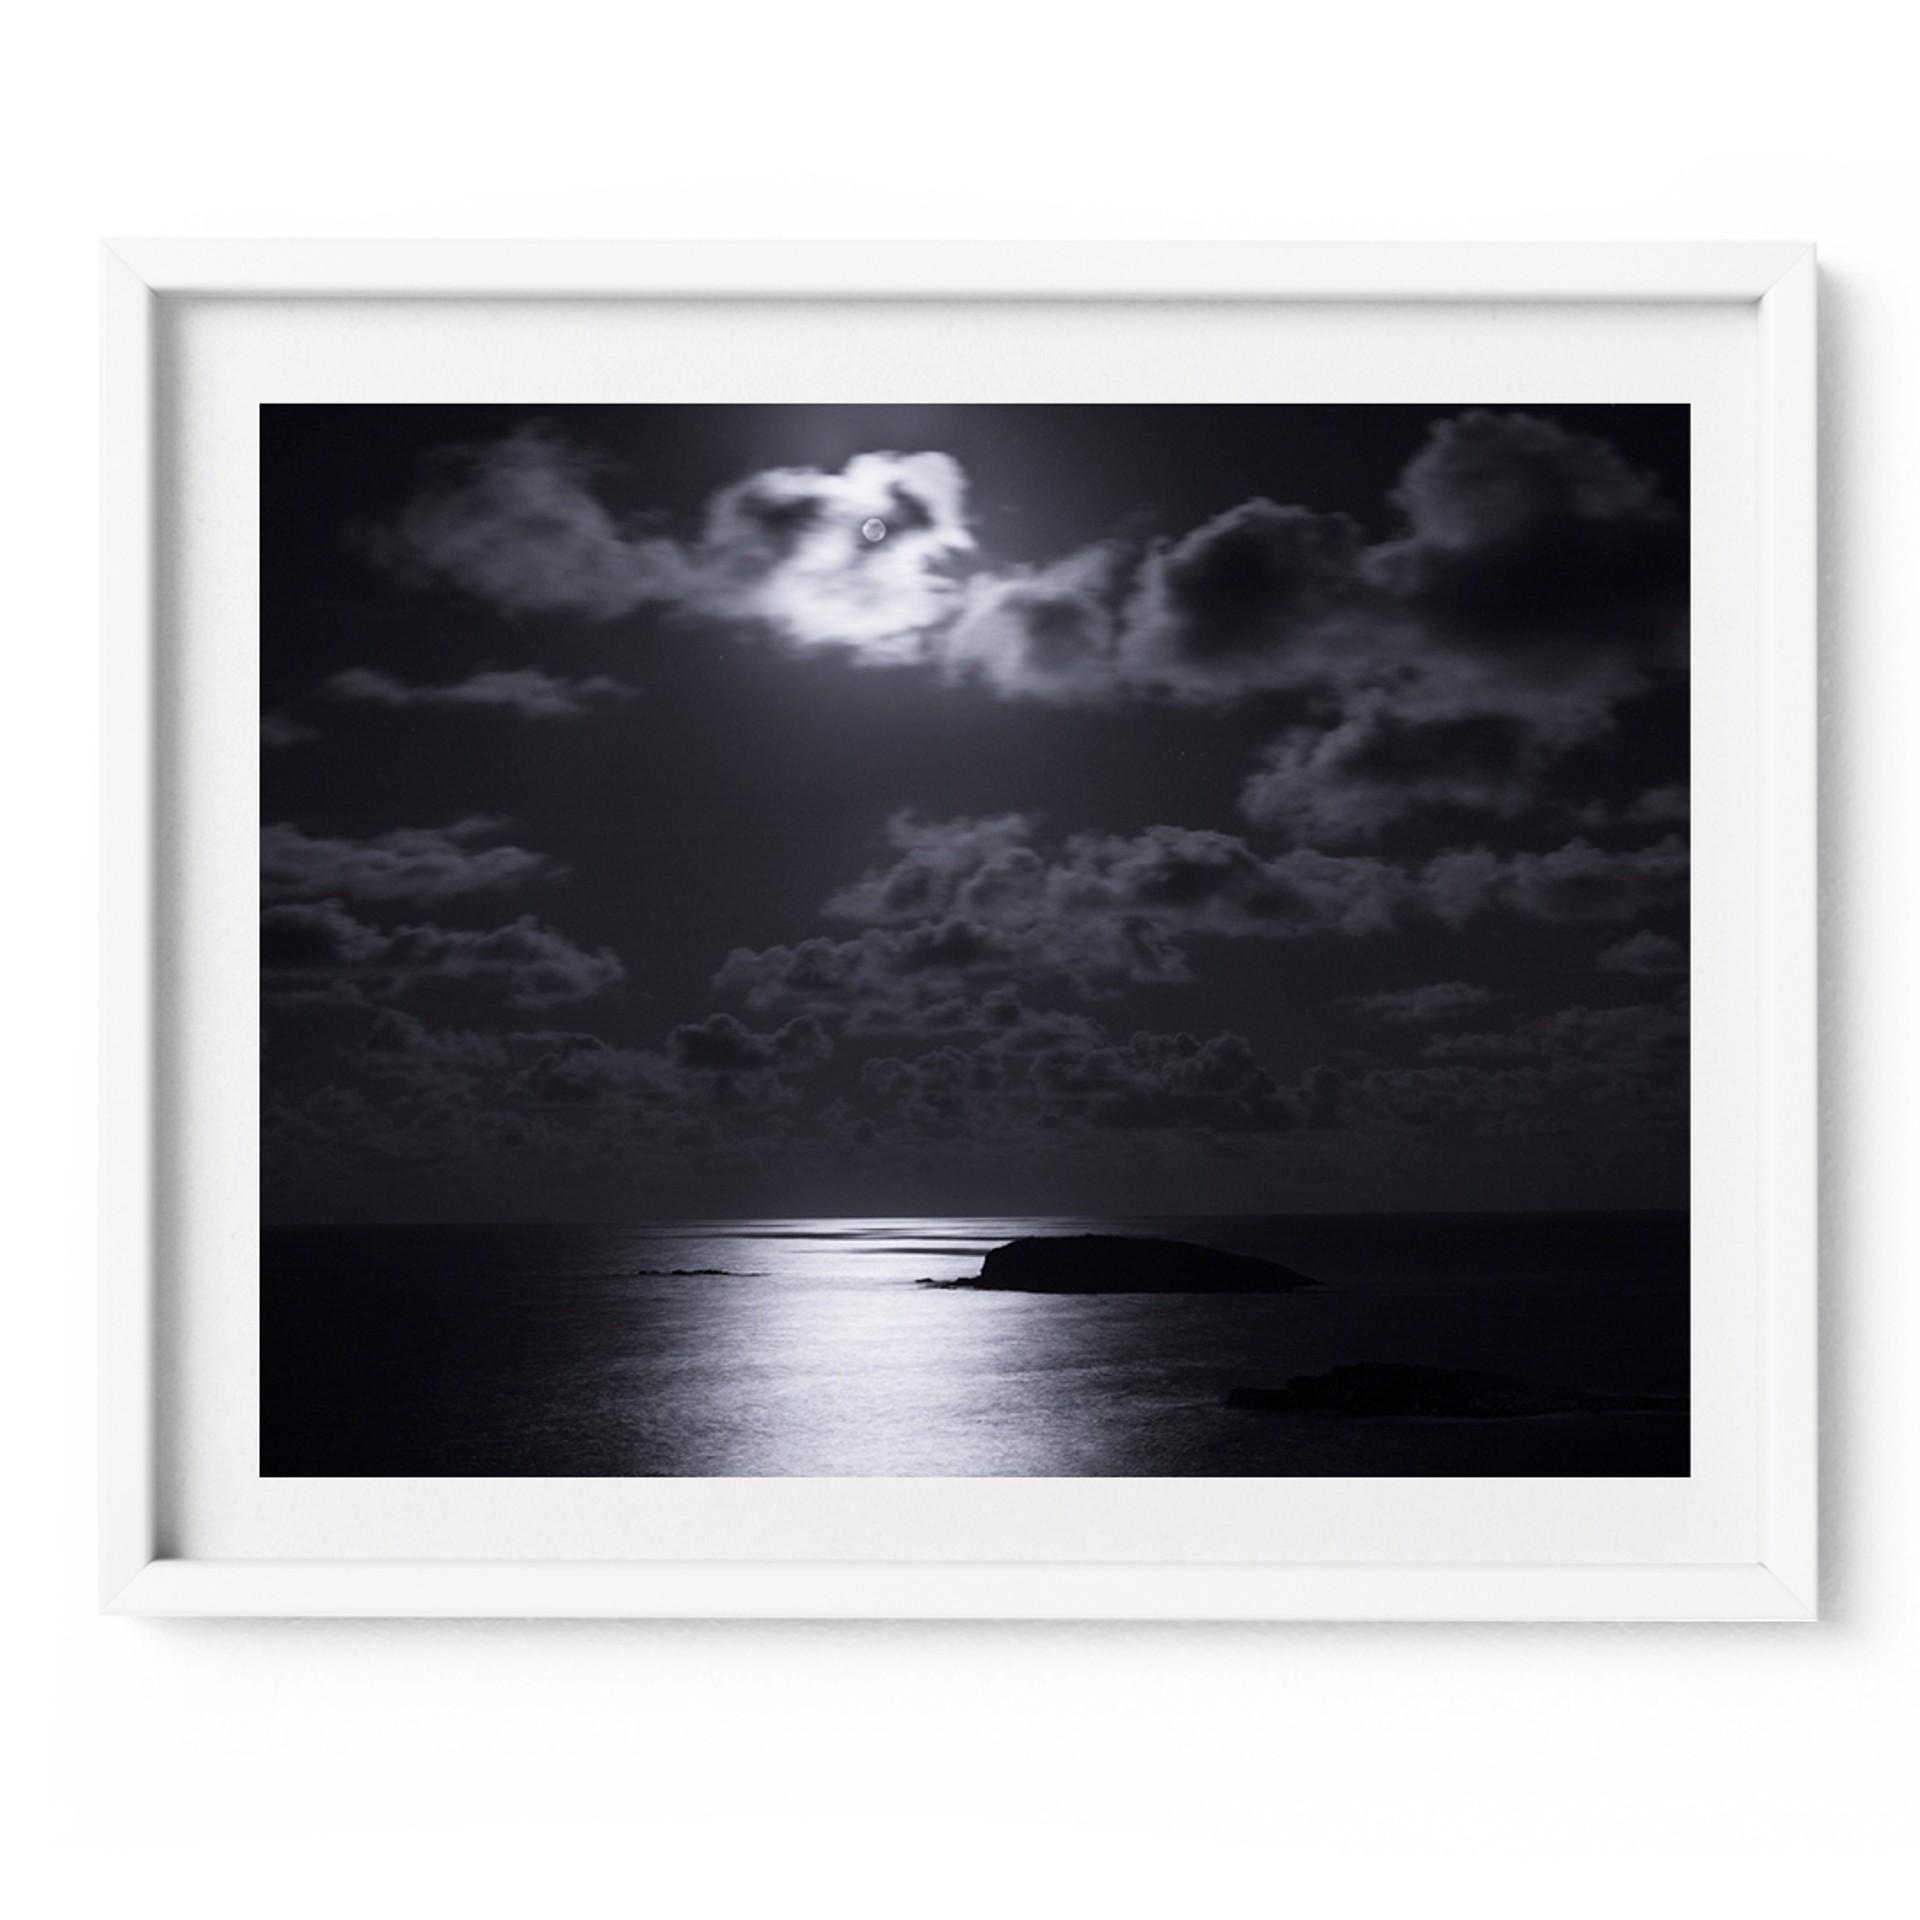 Moonscape #8 by Gabriella Imperatori-Penn